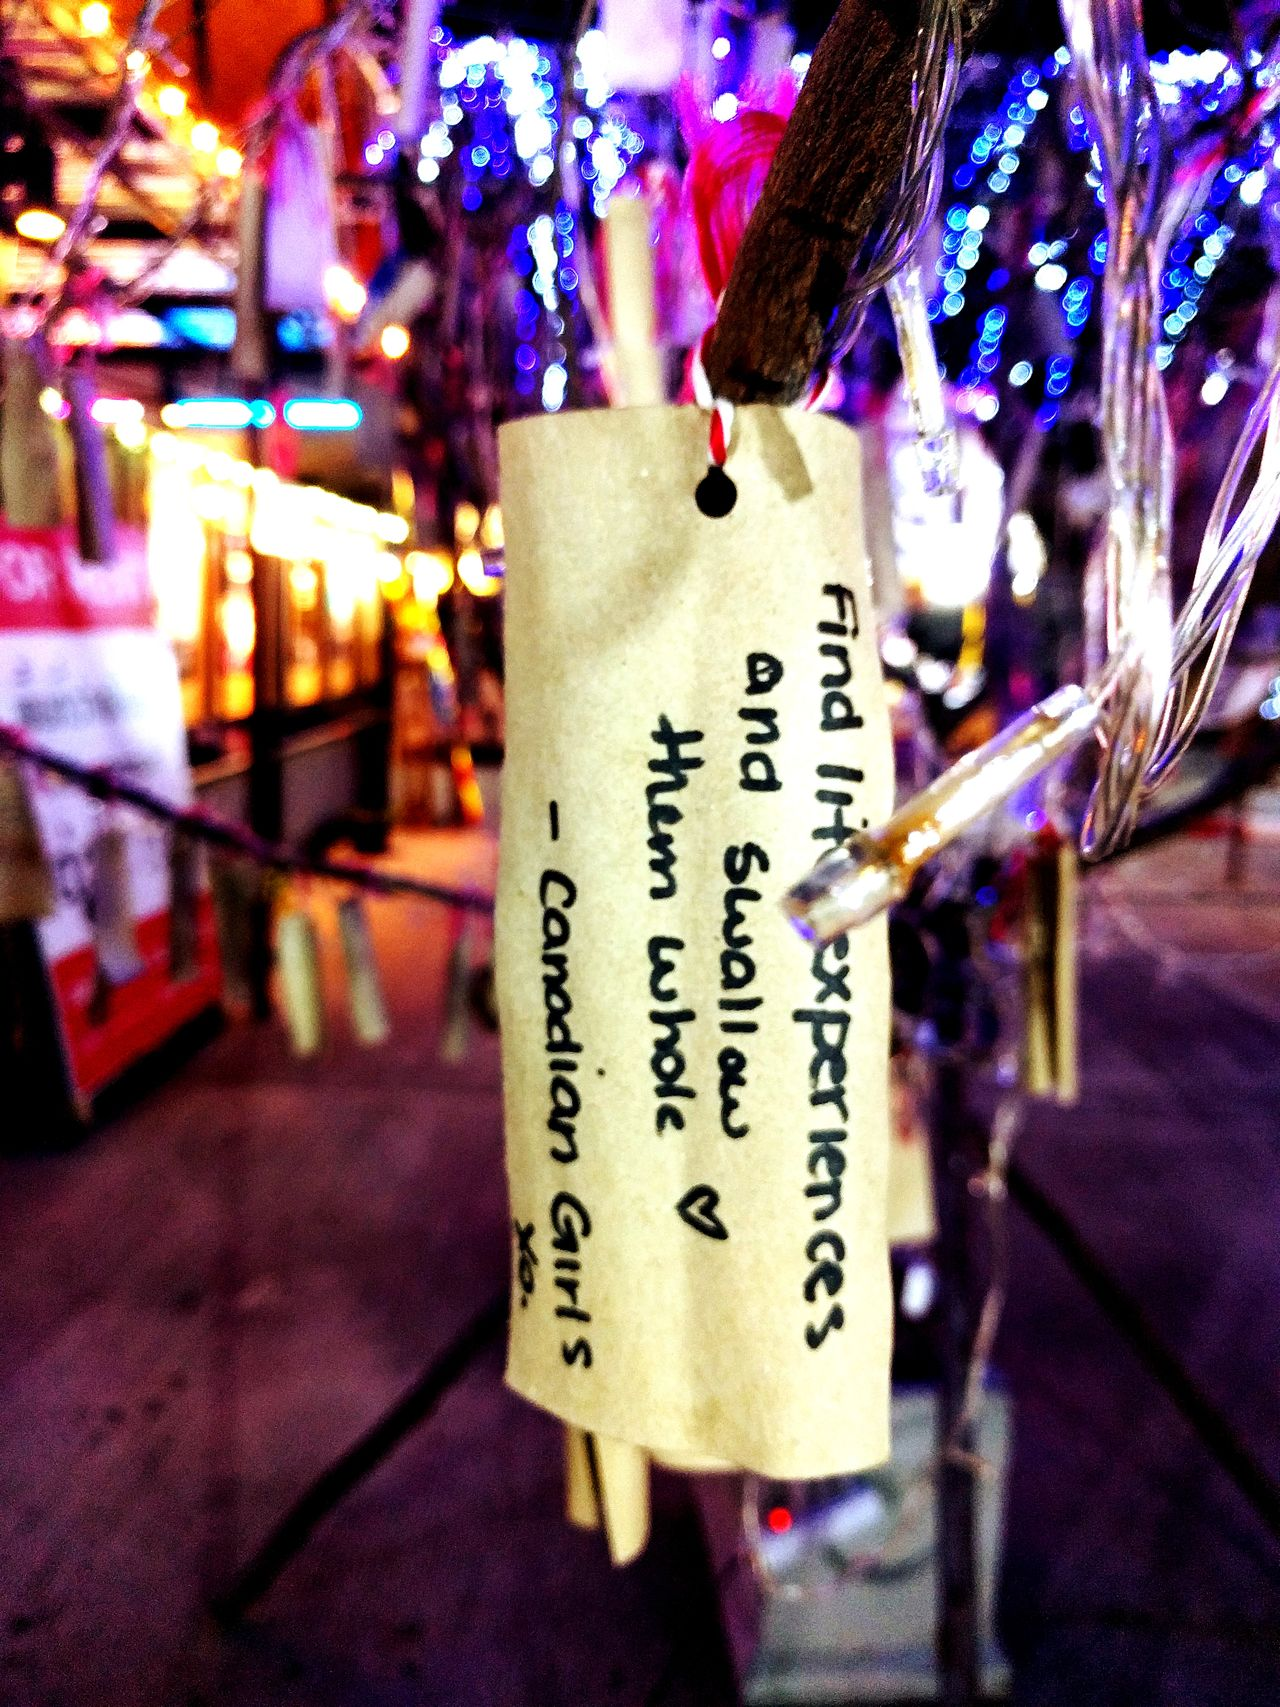 Wish tree Illuminated Night Celebration No People Close-up Outdoors City Chiang Mai | Thailand Chiang Mai Night Barzza Night Market Night Market In Thailand Thailand Wish Tree Wish Tree ASIA Asean Aseantravel Travel Destinations